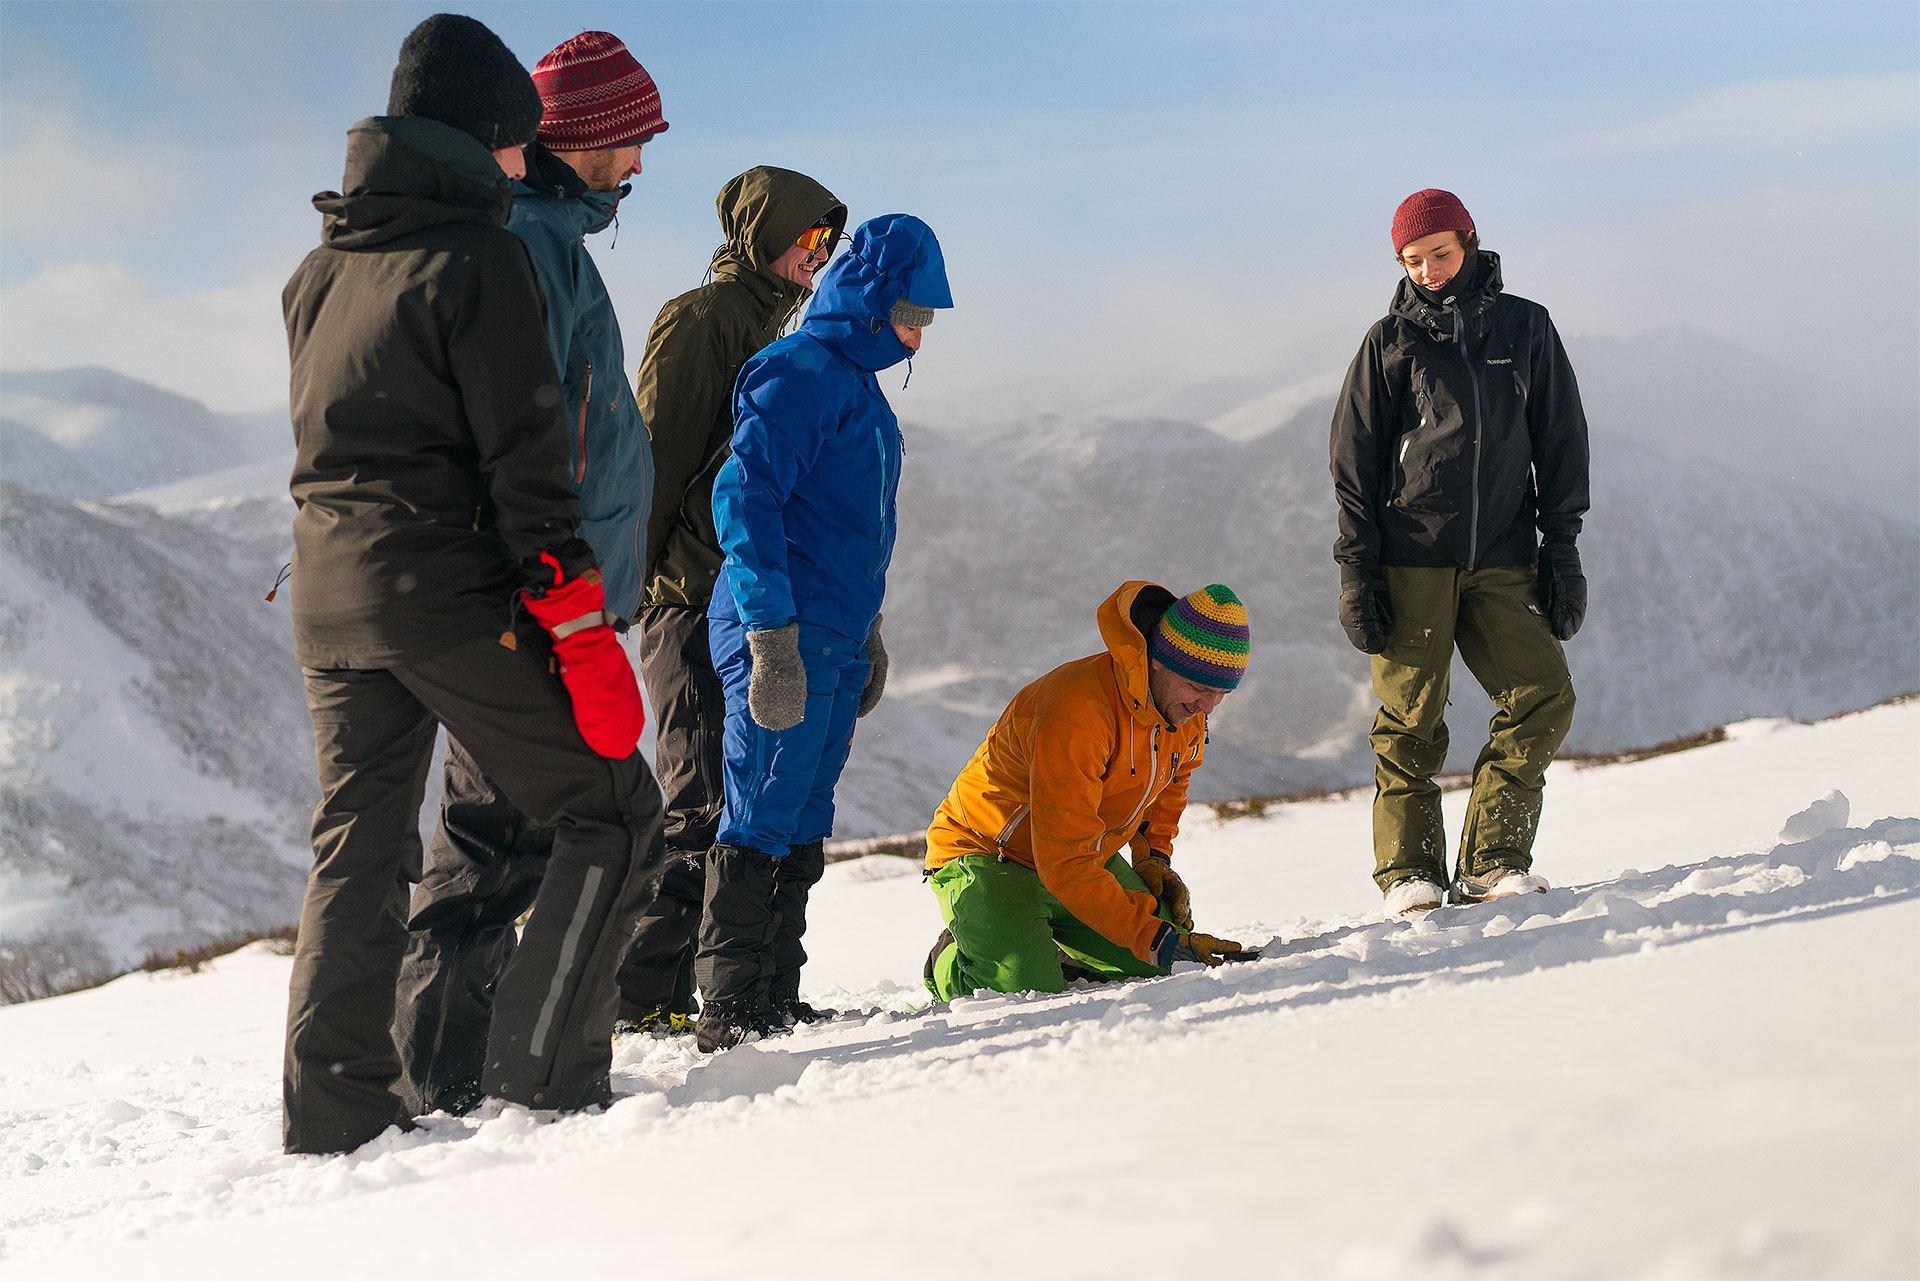 Gjendeguiden - guided activities in Jotunheimen